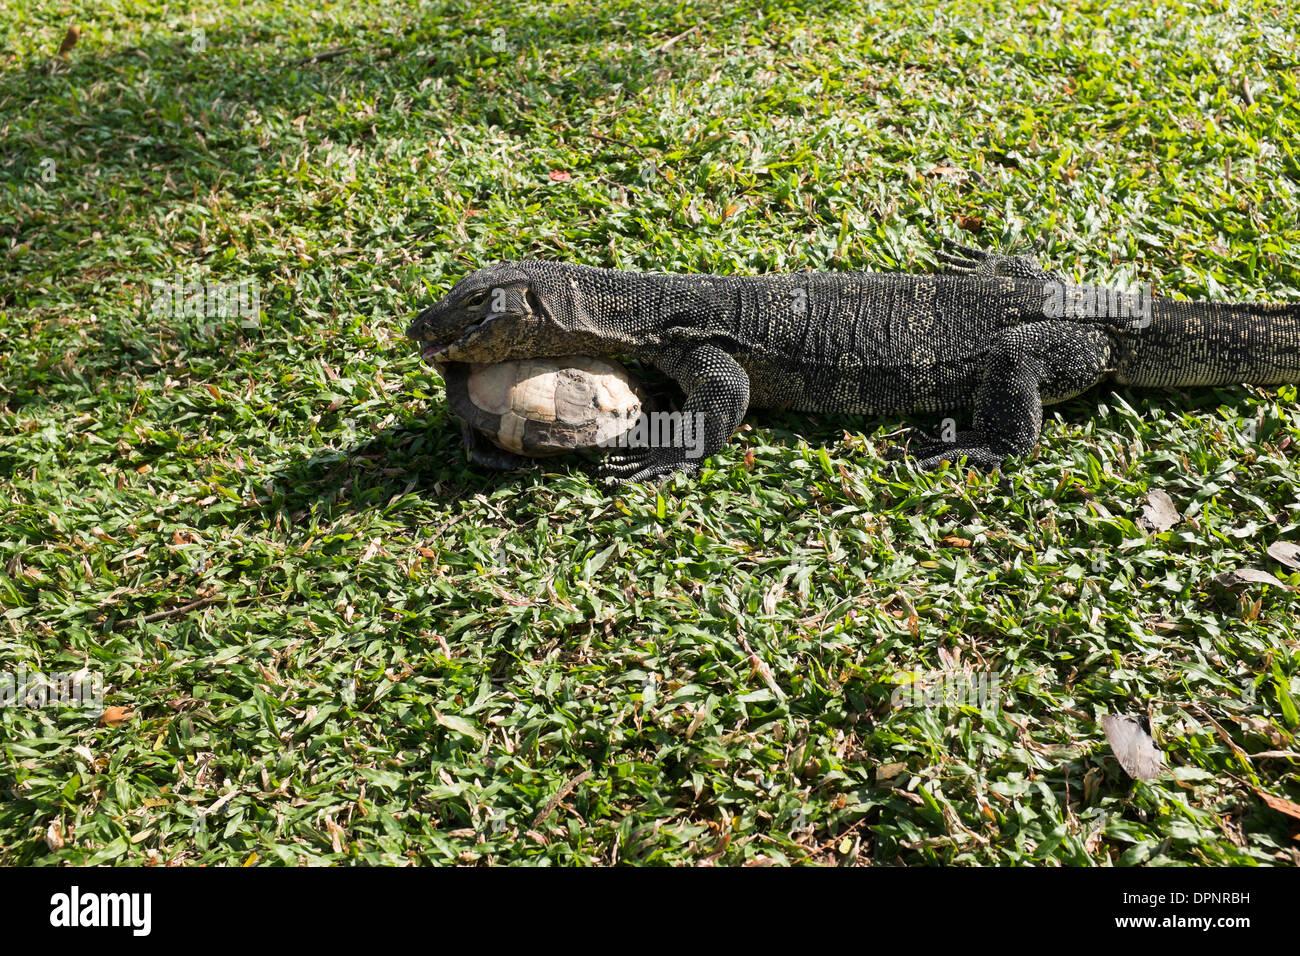 Lizard eating Tortoise in Lumpini Park Bangkok Stock Photo, Royalty Free Imag...